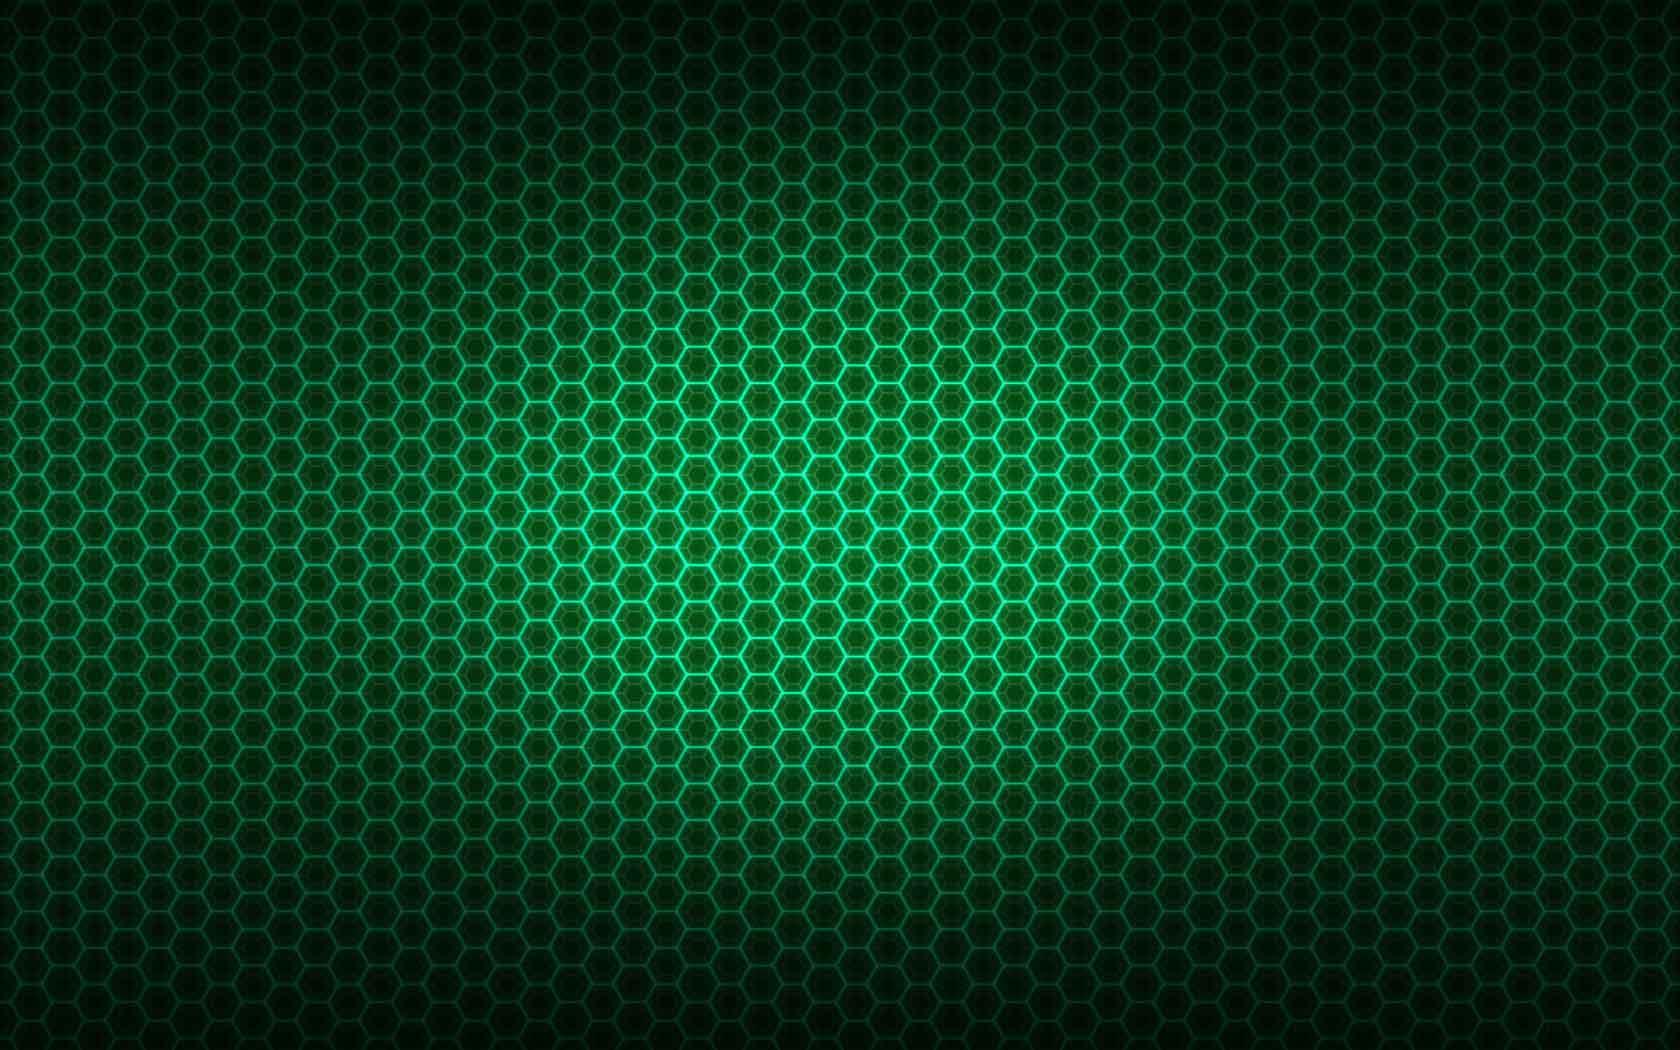 Green Light Gaming